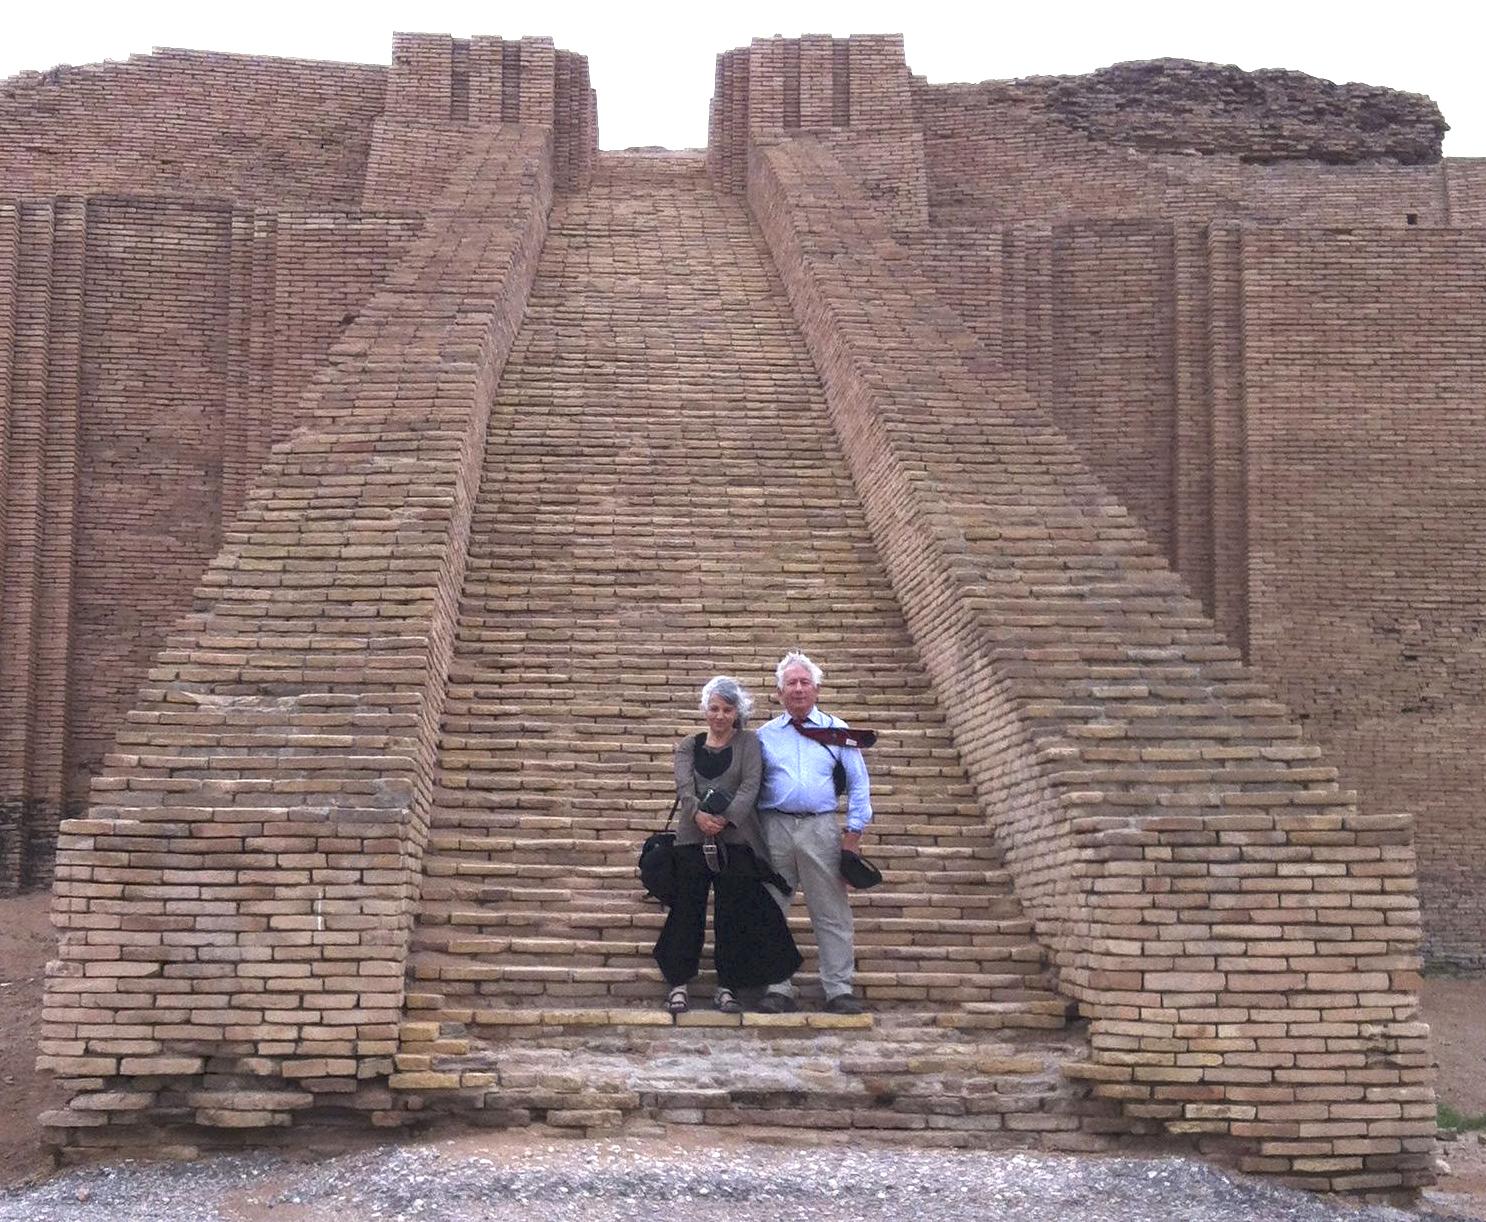 Meridel and Mark Nelson at ziggurat of Ur